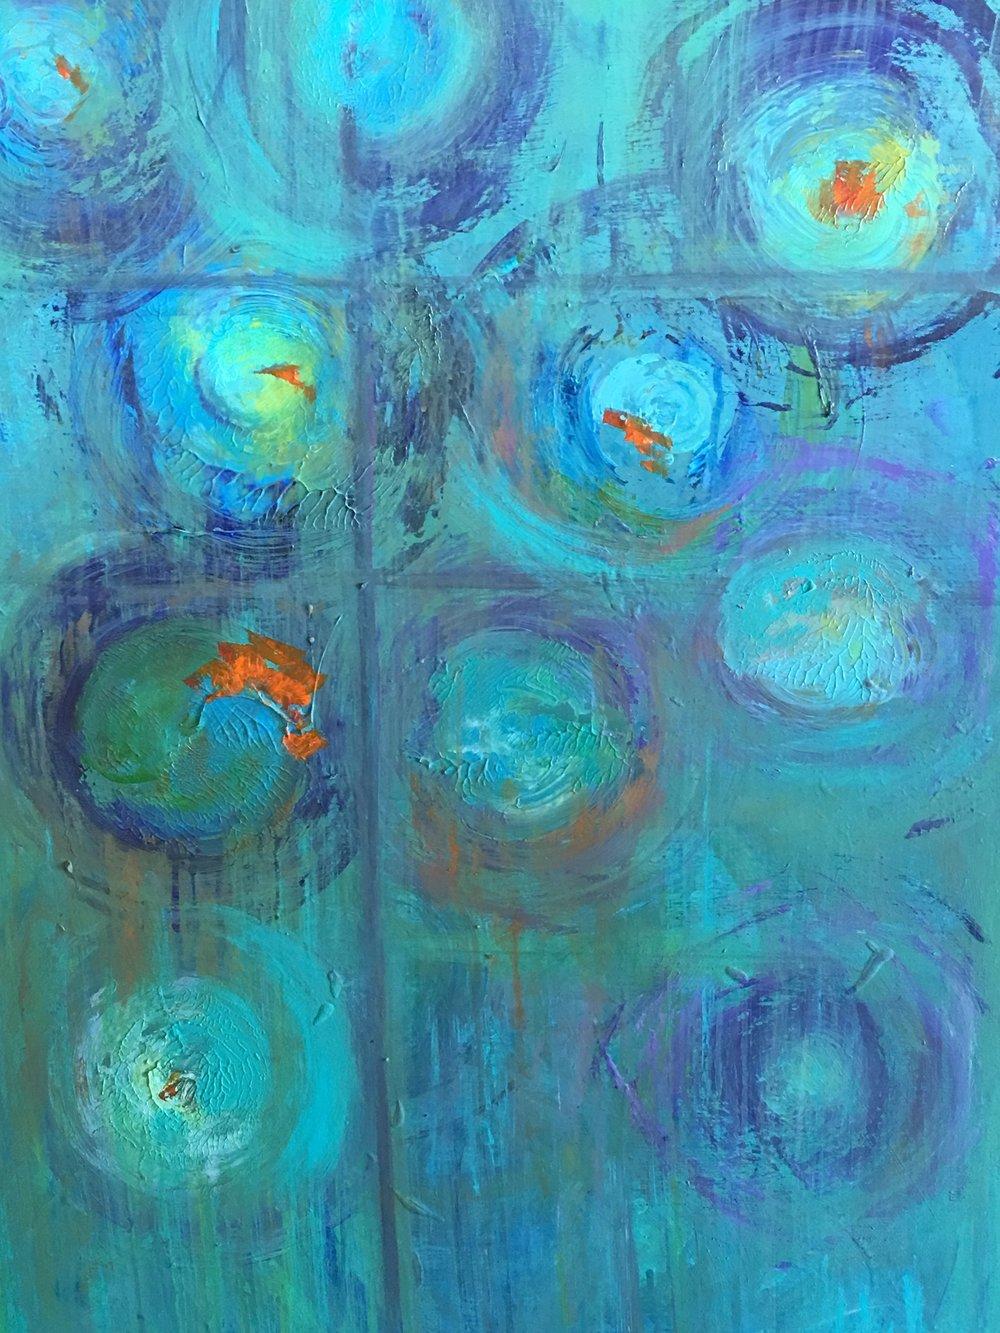 Emerging in Blue